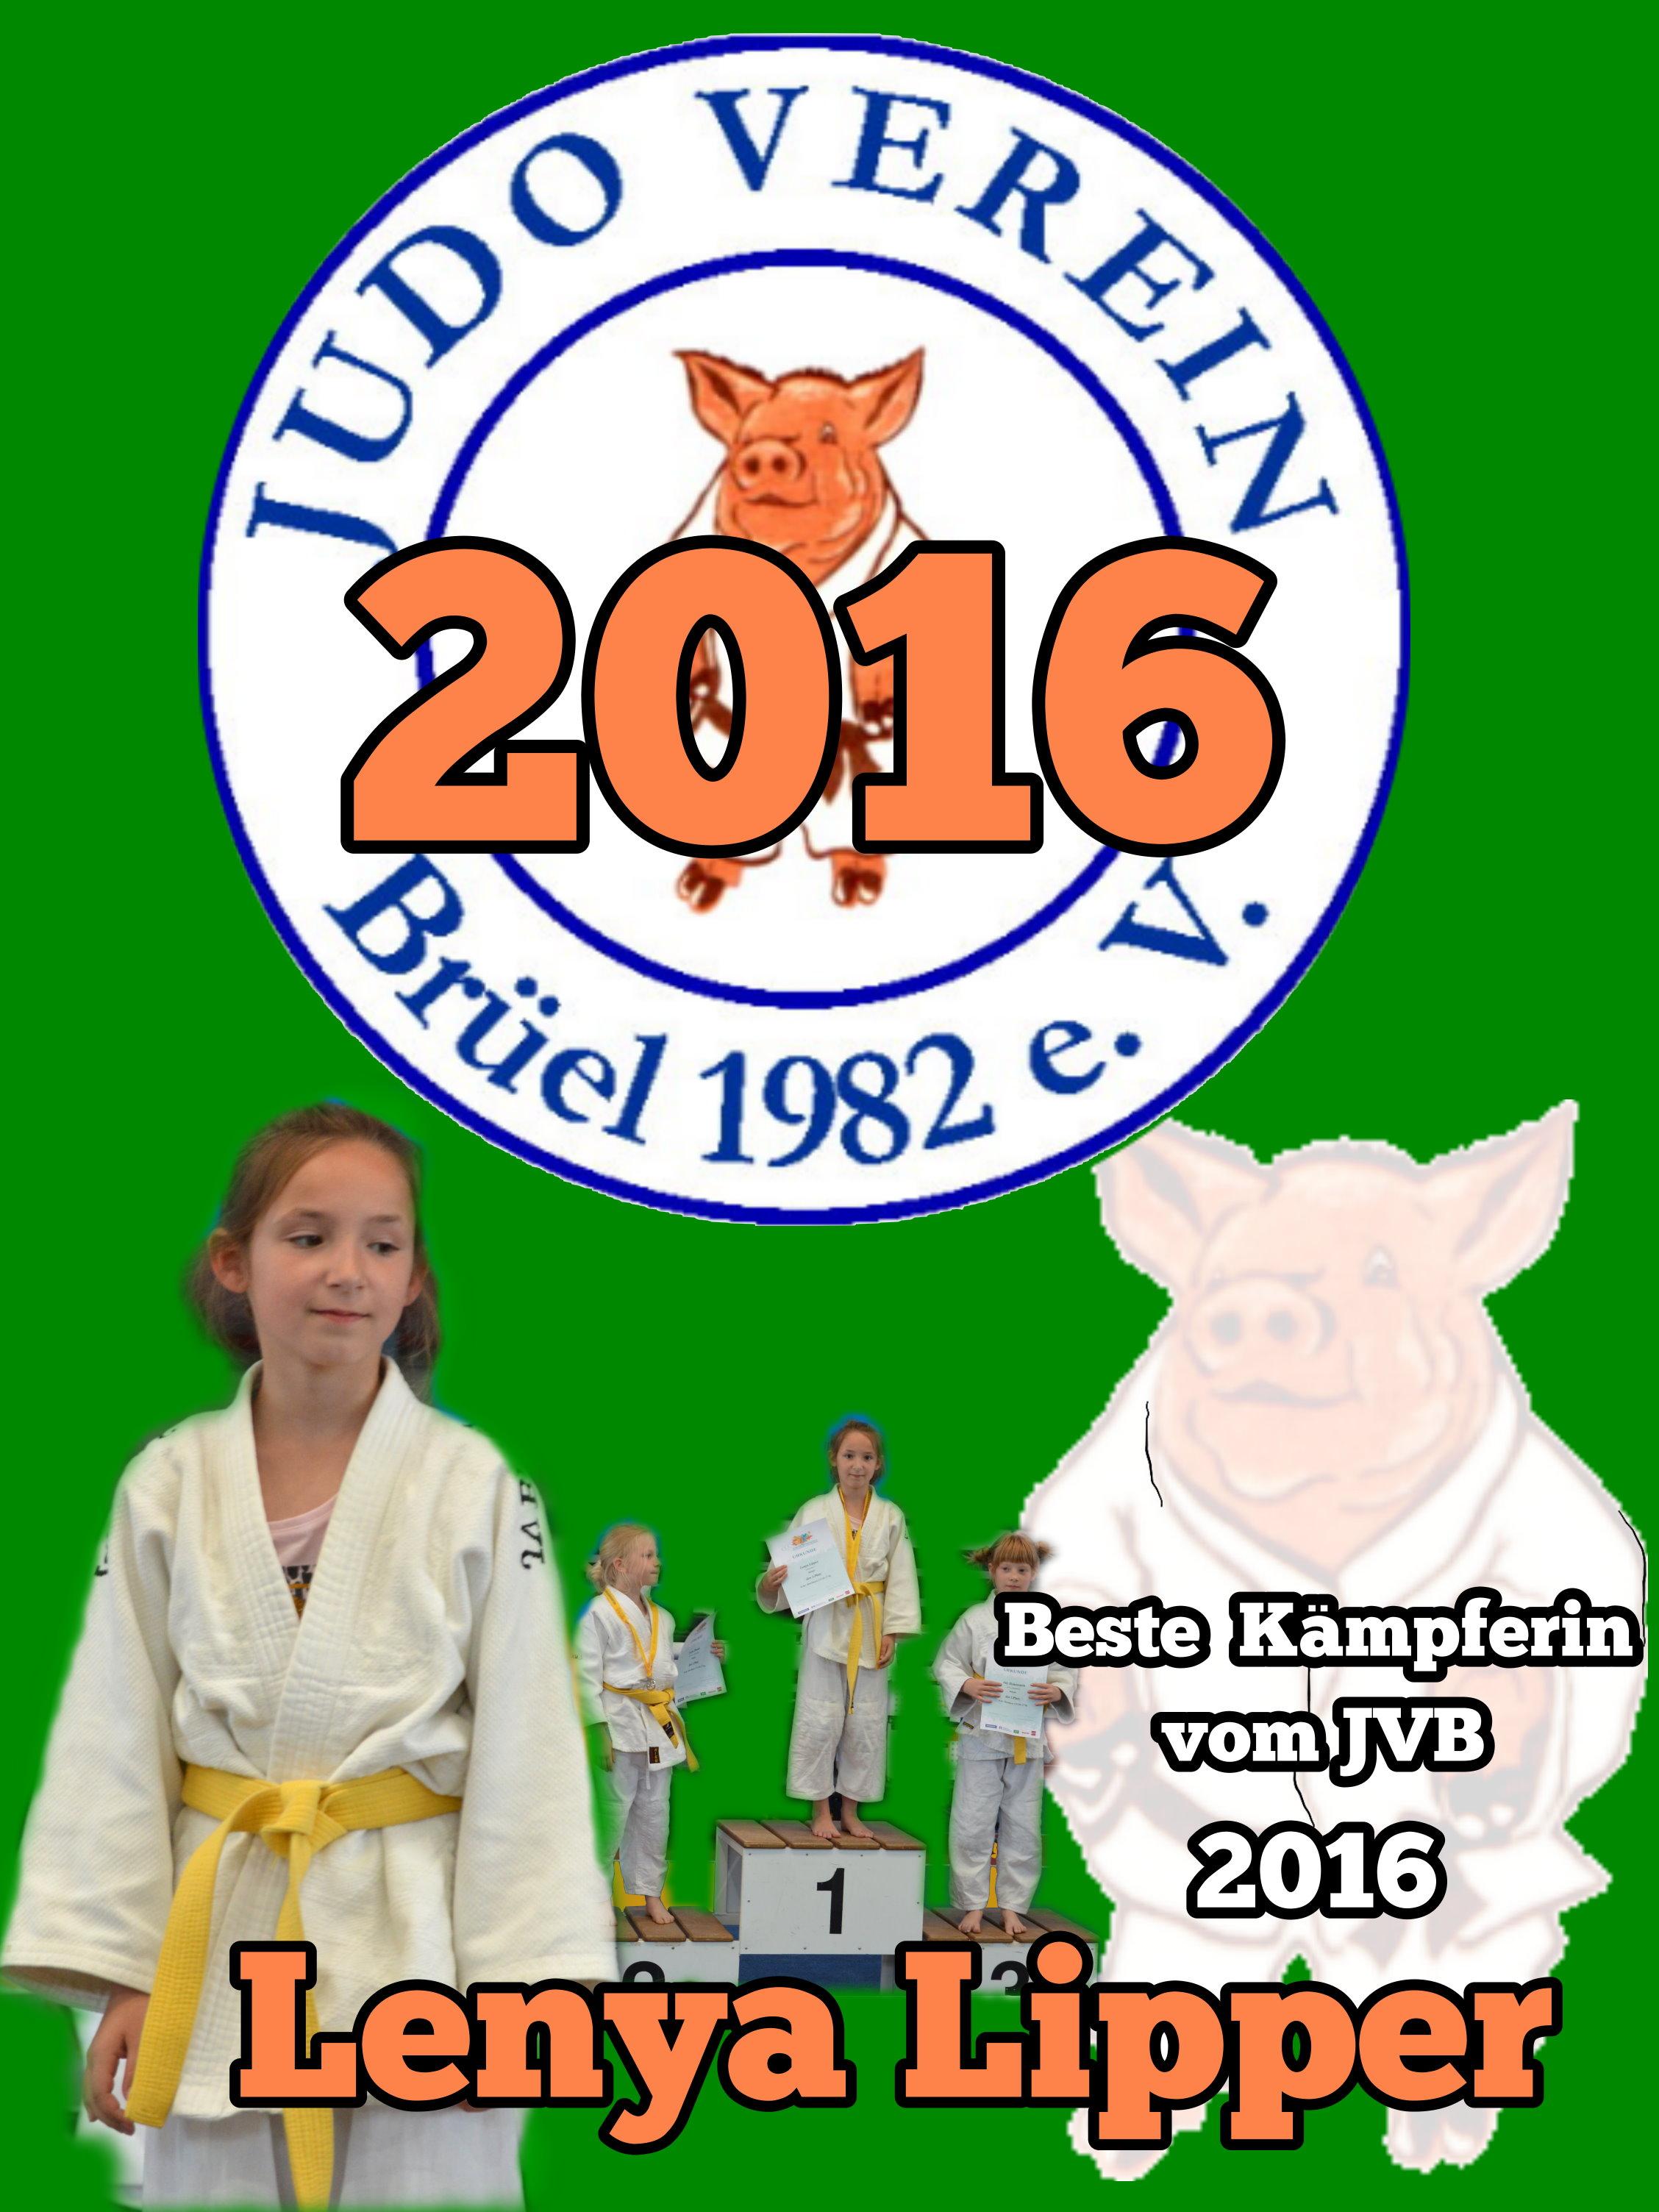 JVB_Auszeichnung_Kaempferin_JVB_2016_Lenya_L